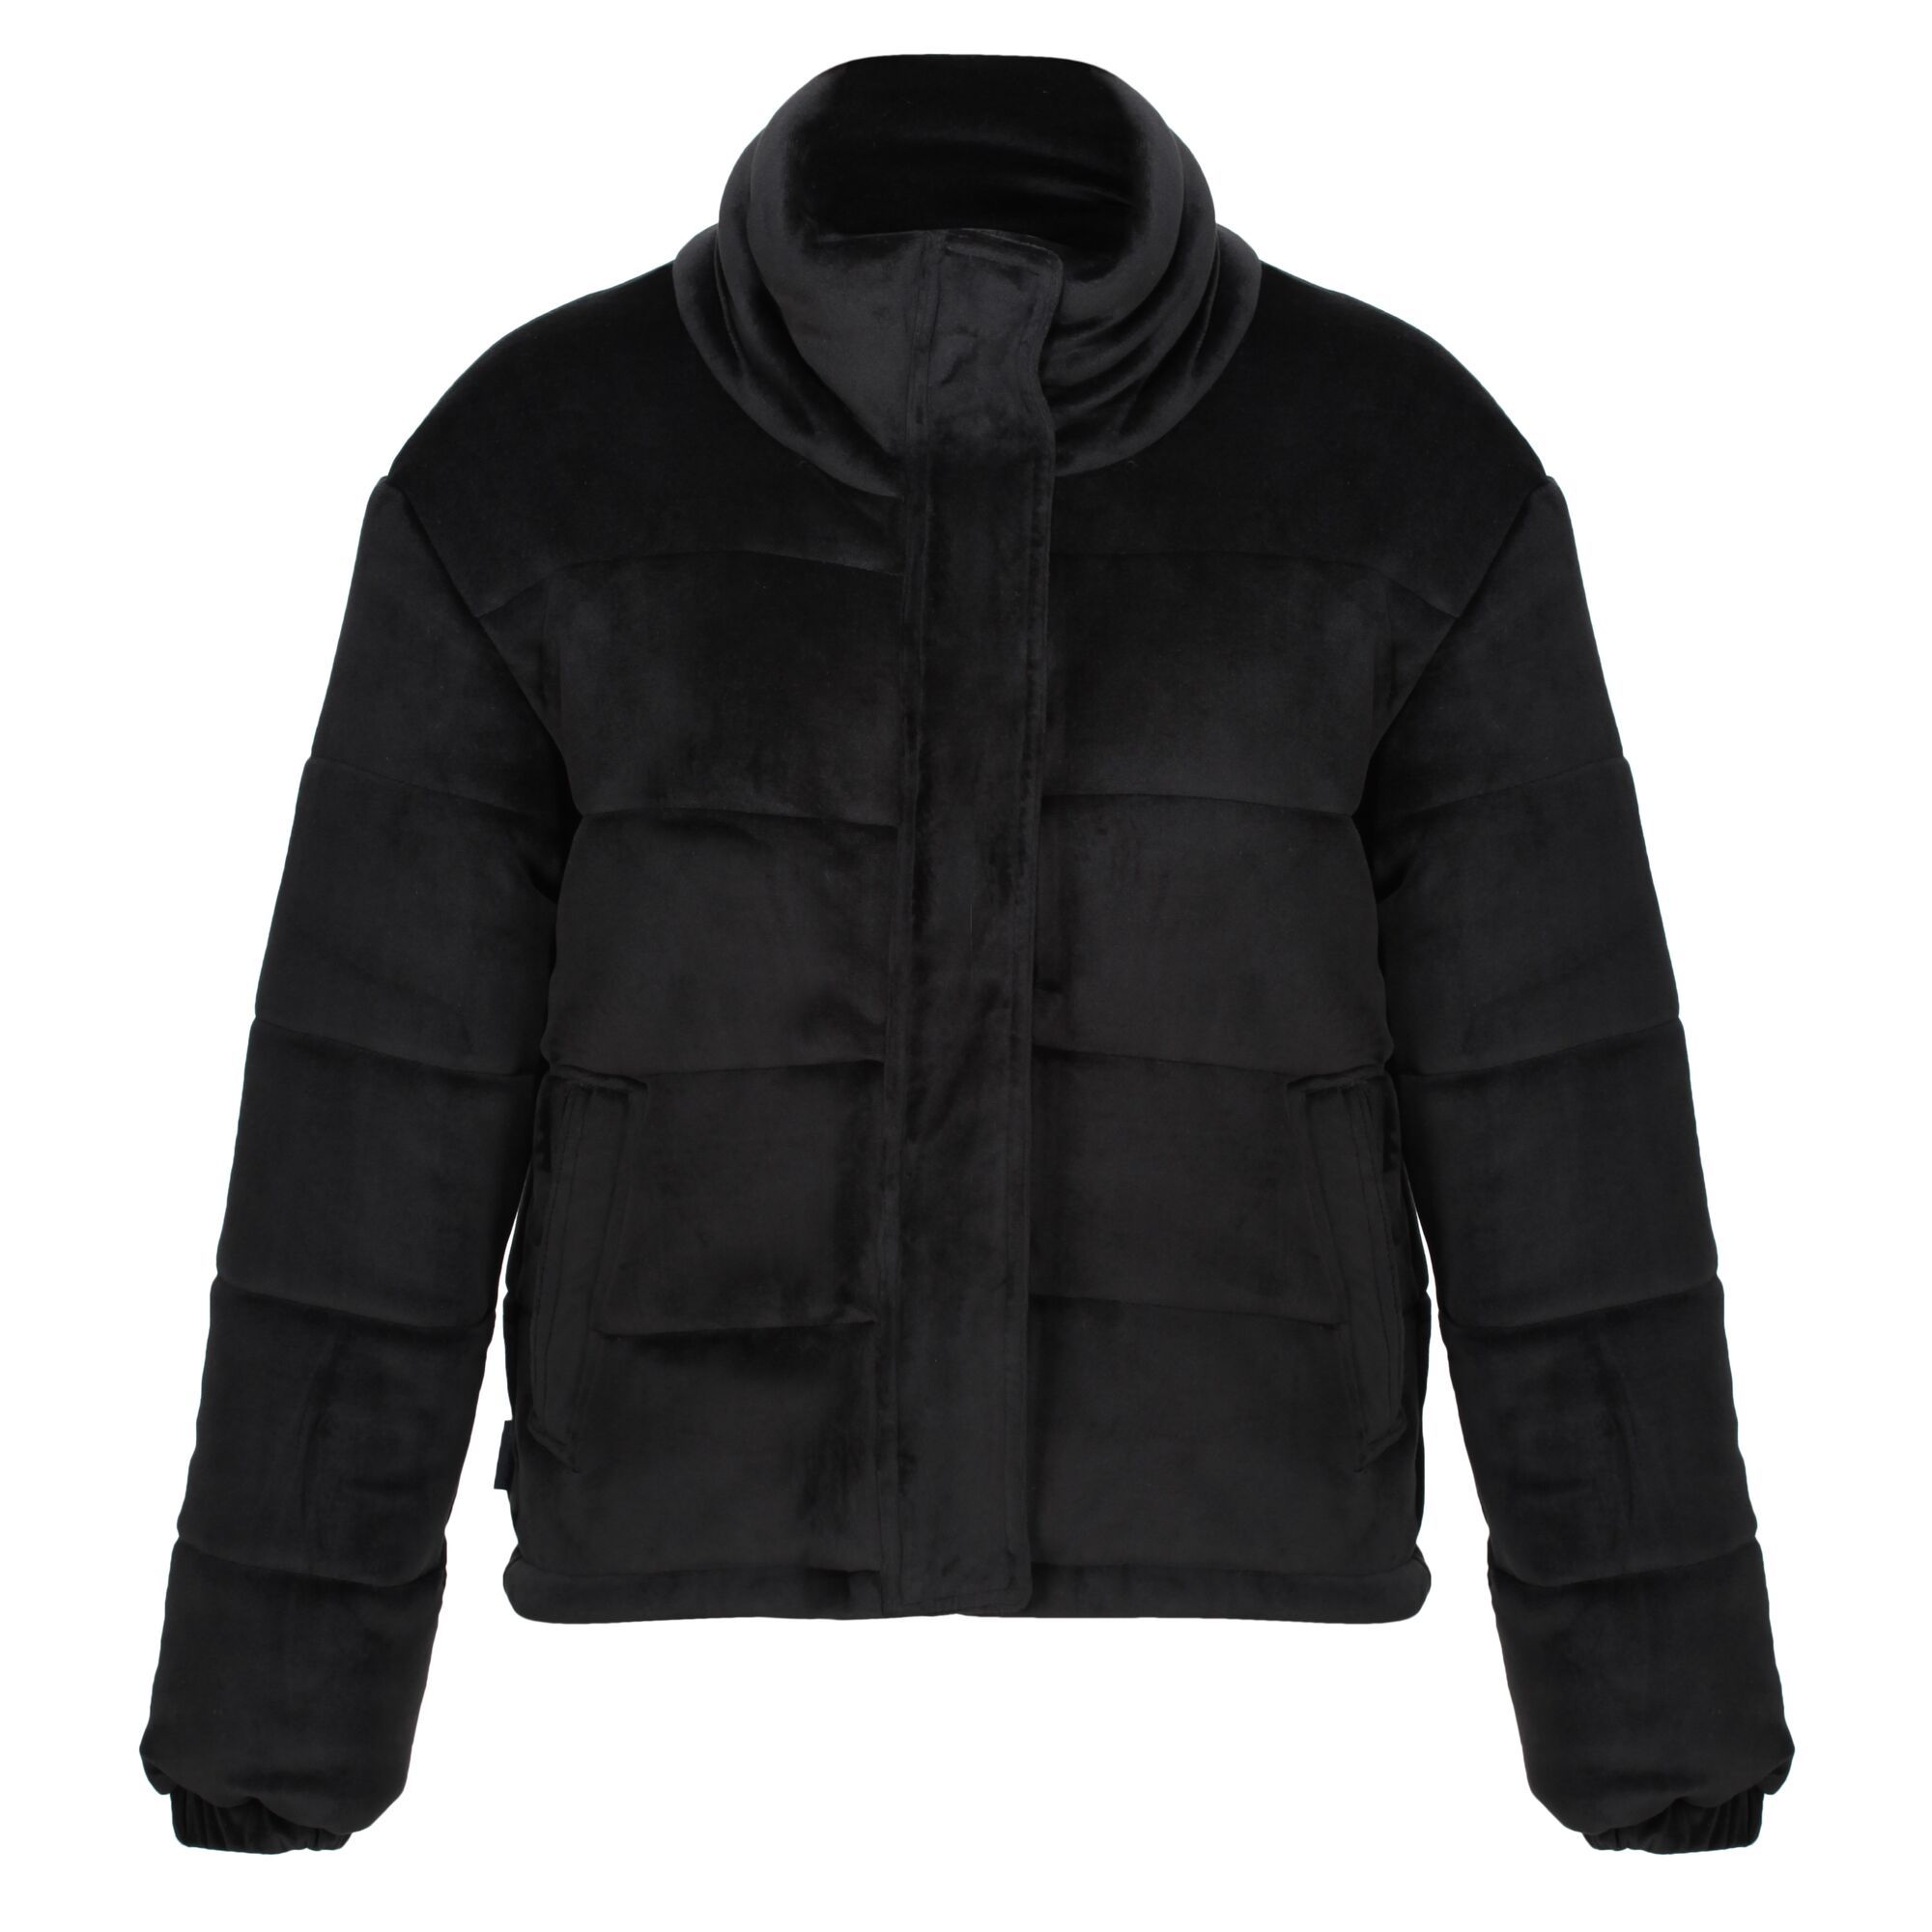 Regatta Womens/Ladies Elbury Walking Insulated Jacket (16 UK) (Black)